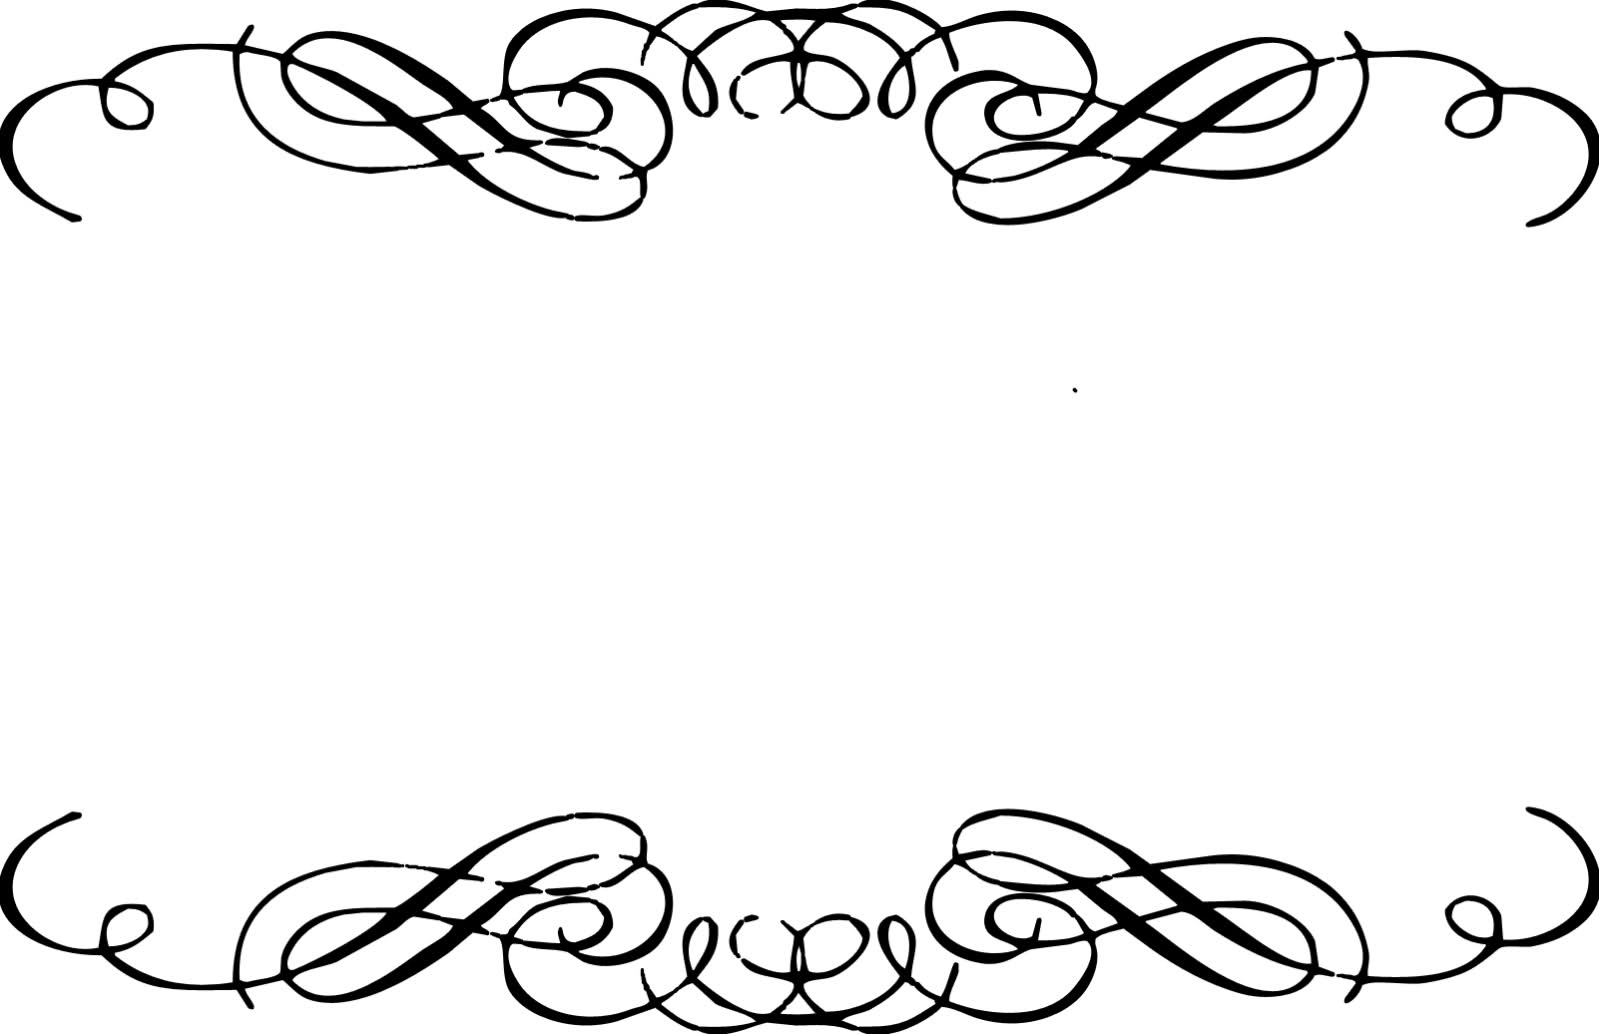 11 Corner Flourish Free Vector Free Clip-11 Corner Flourish Free Vector Free Cliparts That You Can Download To-0